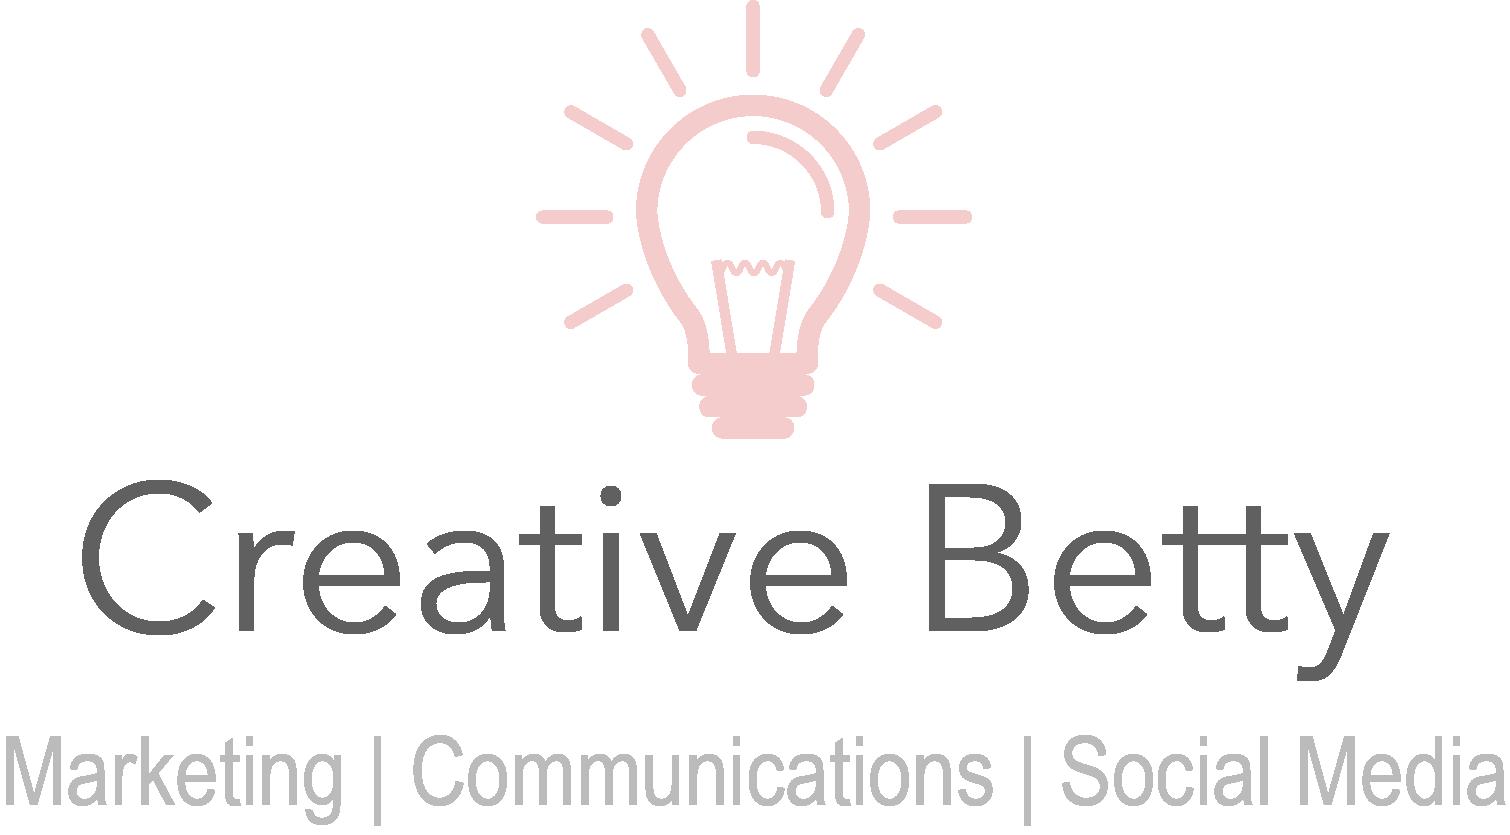 Creative Betty